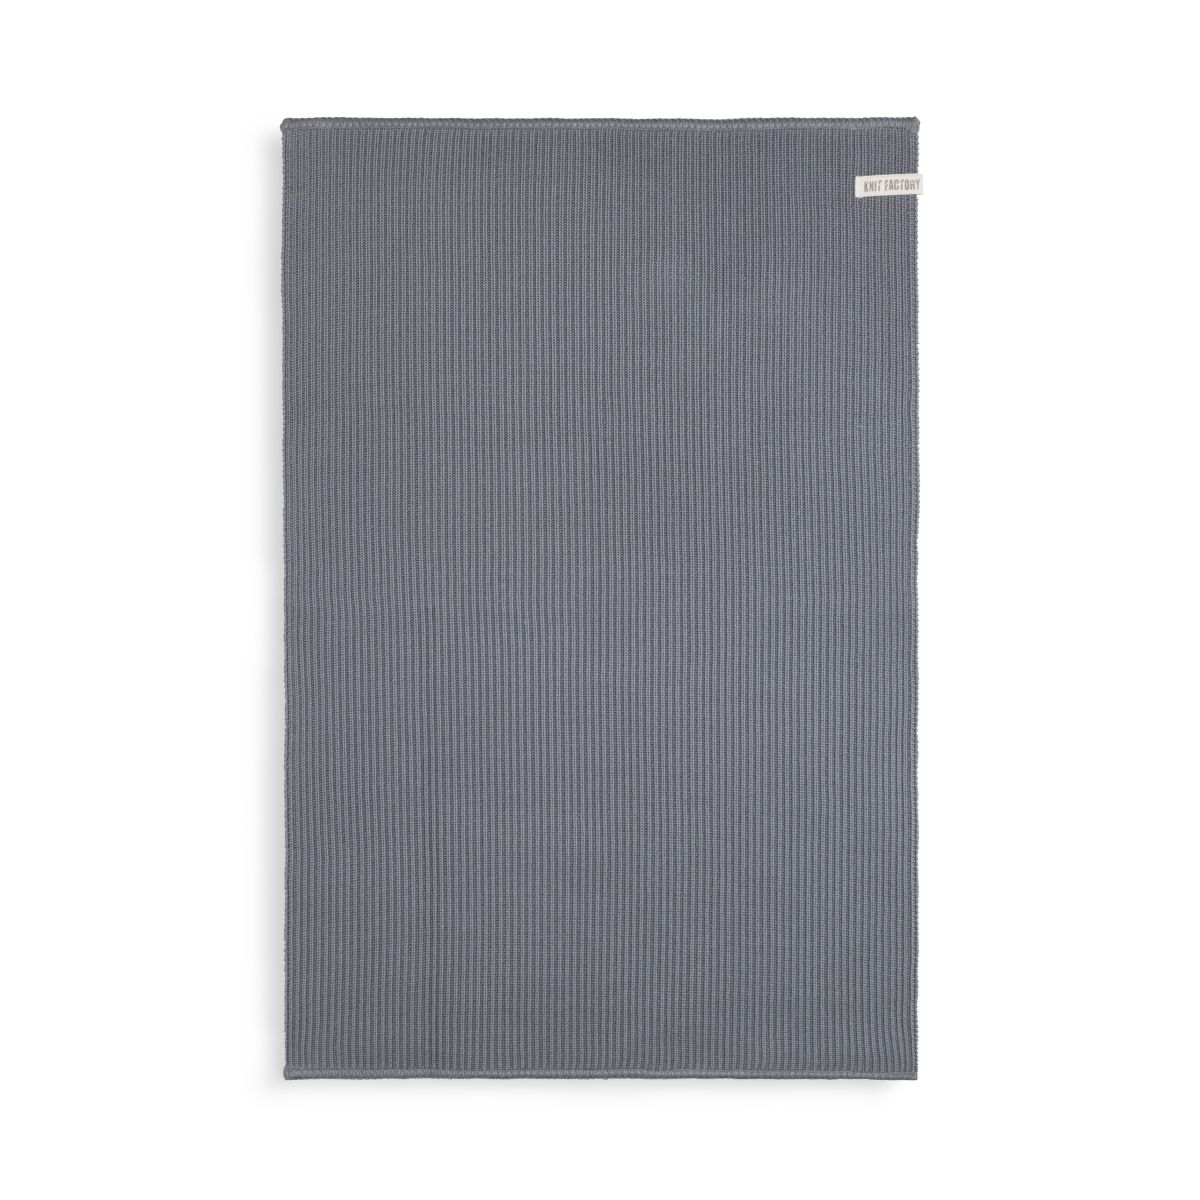 knit factory kf20322800652 badmat morres med grey 80x50 1